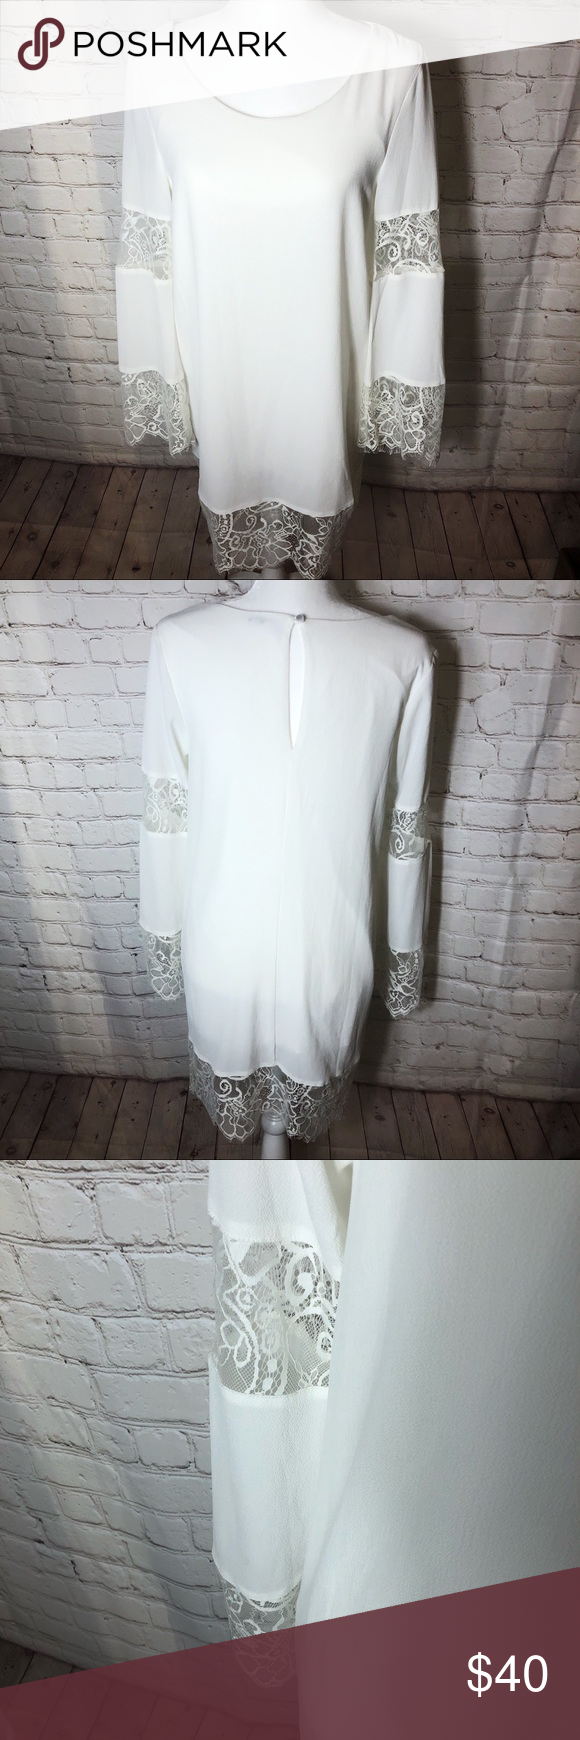 Lulu S Lace White Long Sleeve Bridal Shower Dress Bridal Shower Dress White Long Sleeve Shower Dresses [ 1740 x 580 Pixel ]